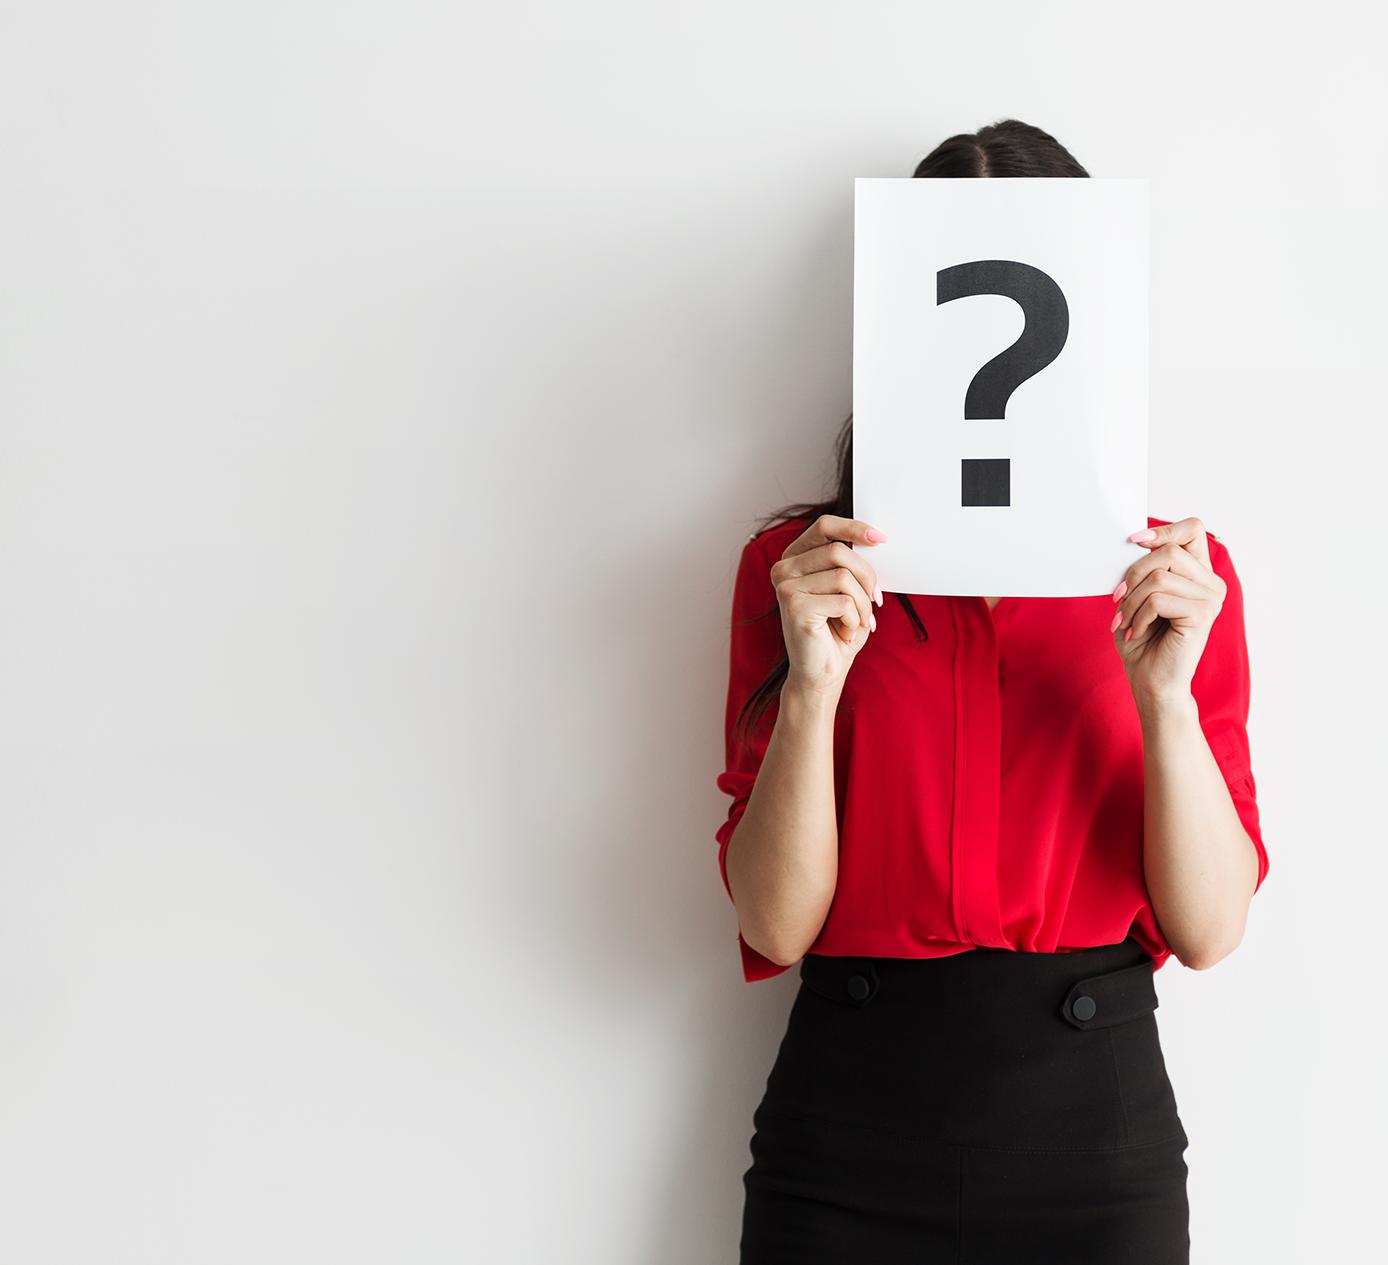 A importância do anonimato no canal de denúncias nas empresas